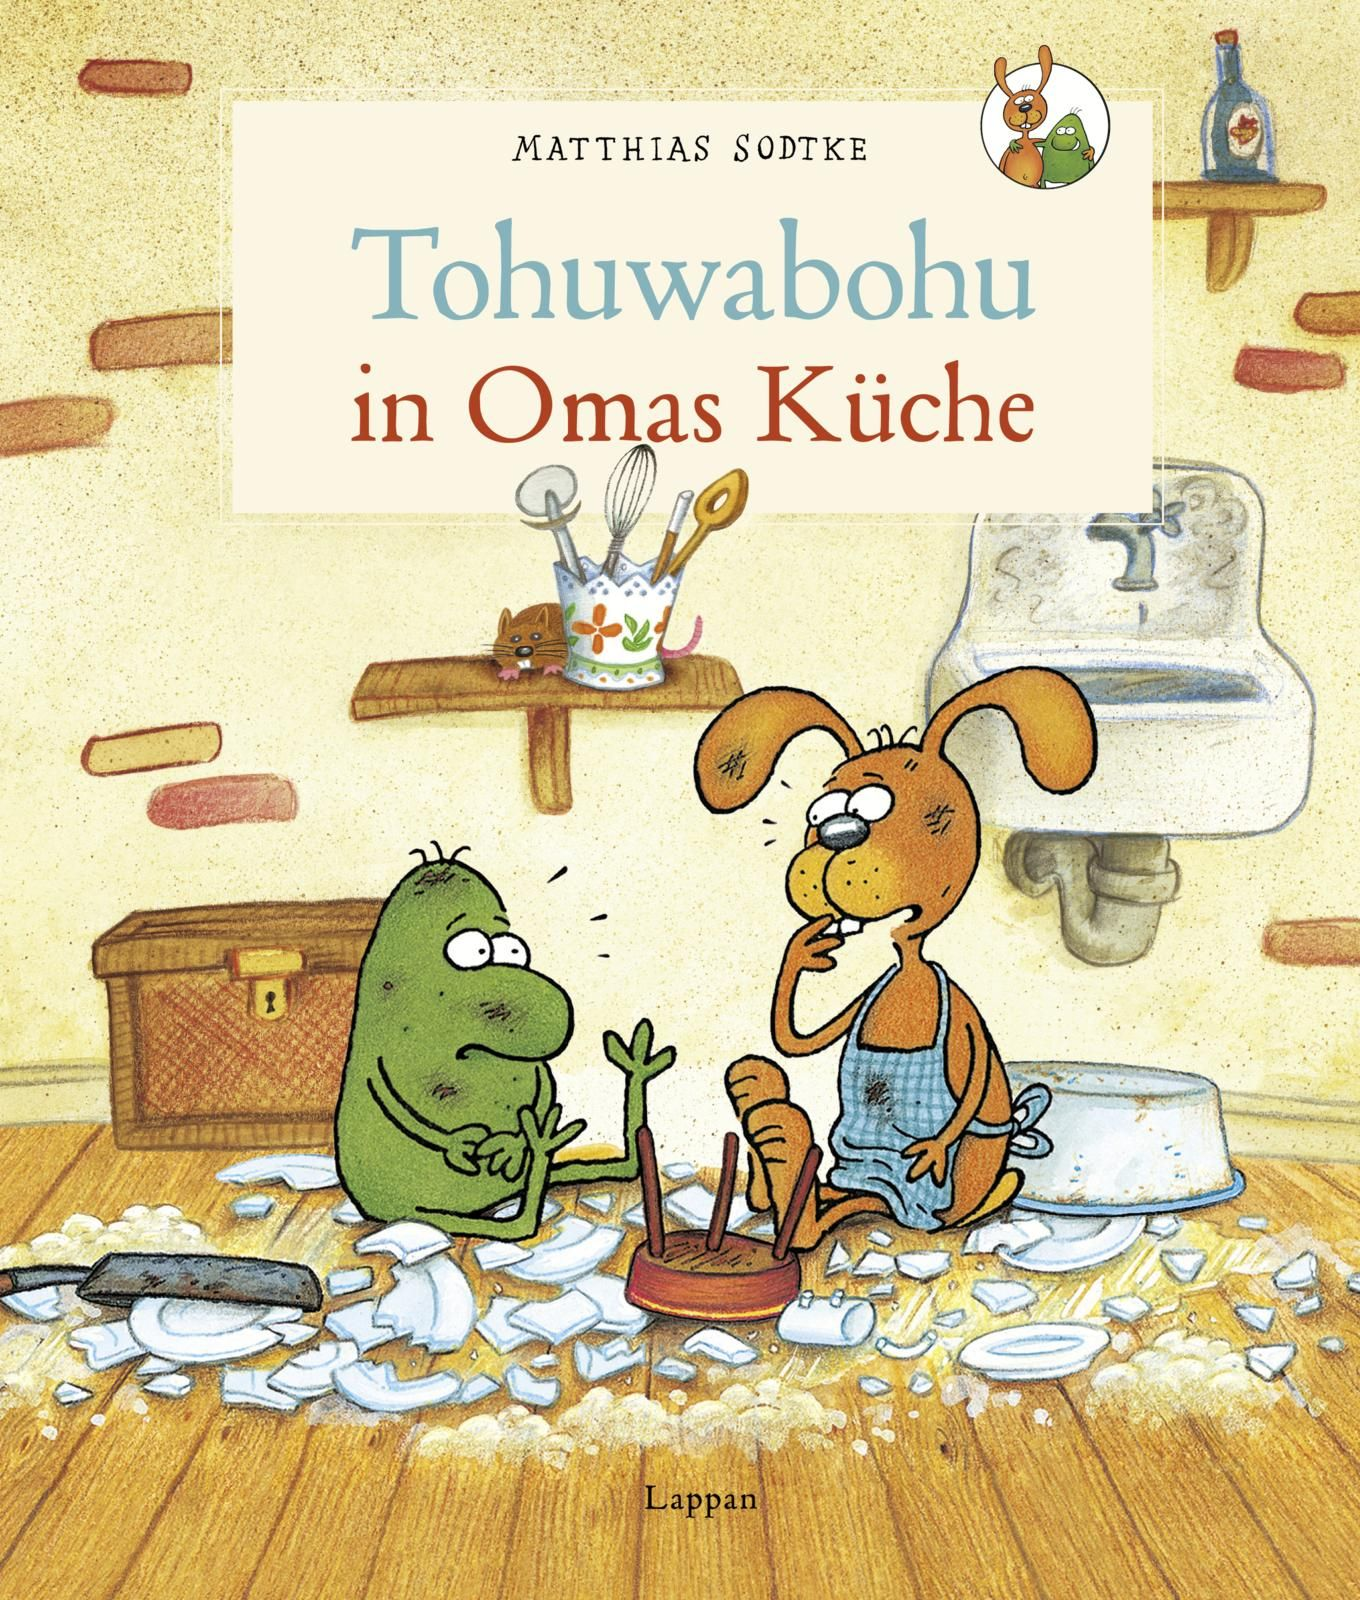 Tohuwabohu in Omas Küche von Sodtke, Matthias: